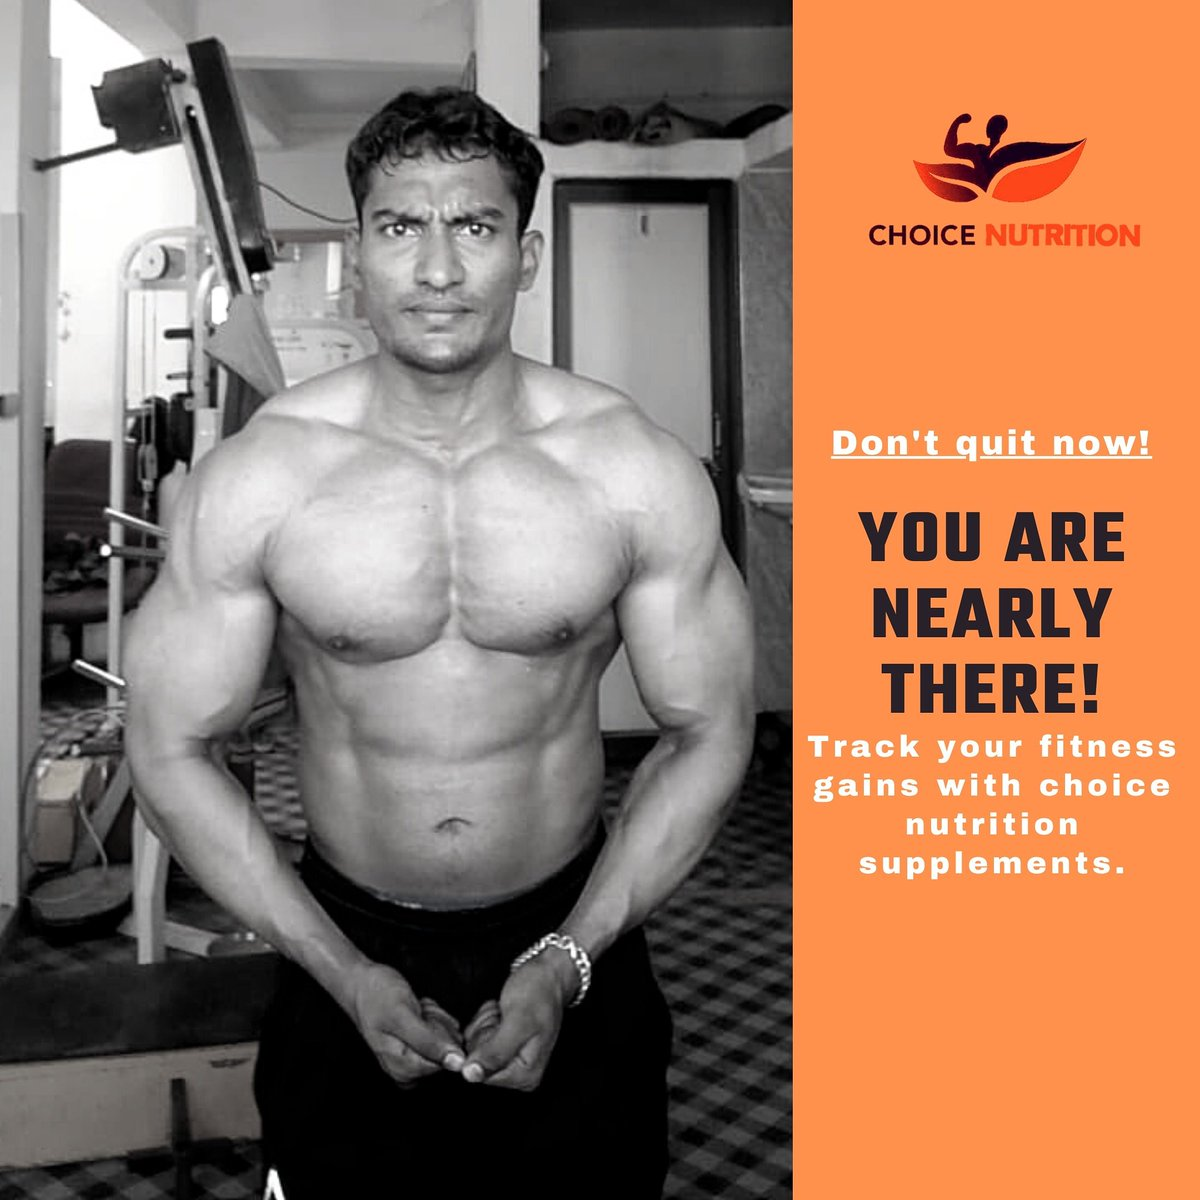 𝐓𝐡𝐞 𝐡𝐚𝐫𝐝𝐞𝐬𝐭 𝐭𝐡𝐢𝐧𝐠 𝐚𝐛𝐨𝐮𝐭 𝐞𝐚𝐫𝐧𝐢𝐧𝐠 𝐚 𝐭𝐢𝐭𝐥𝐞 𝐢𝐬 𝐭𝐡𝐞 𝐚𝐛𝐢𝐥𝐢𝐭𝐲 𝐭𝐨 𝐥𝐢𝐯𝐞 𝐮𝐩 𝐭𝐨 𝐢𝐭.  @aslamdeshmukh  @musclepowerindia   #instafit #motivation #fit #TFLers #fitness #gymlife #pushpullgrind #grindout #flex #instafitness #gym #trainhardpic.twitter.com/gSBjWO0K9R